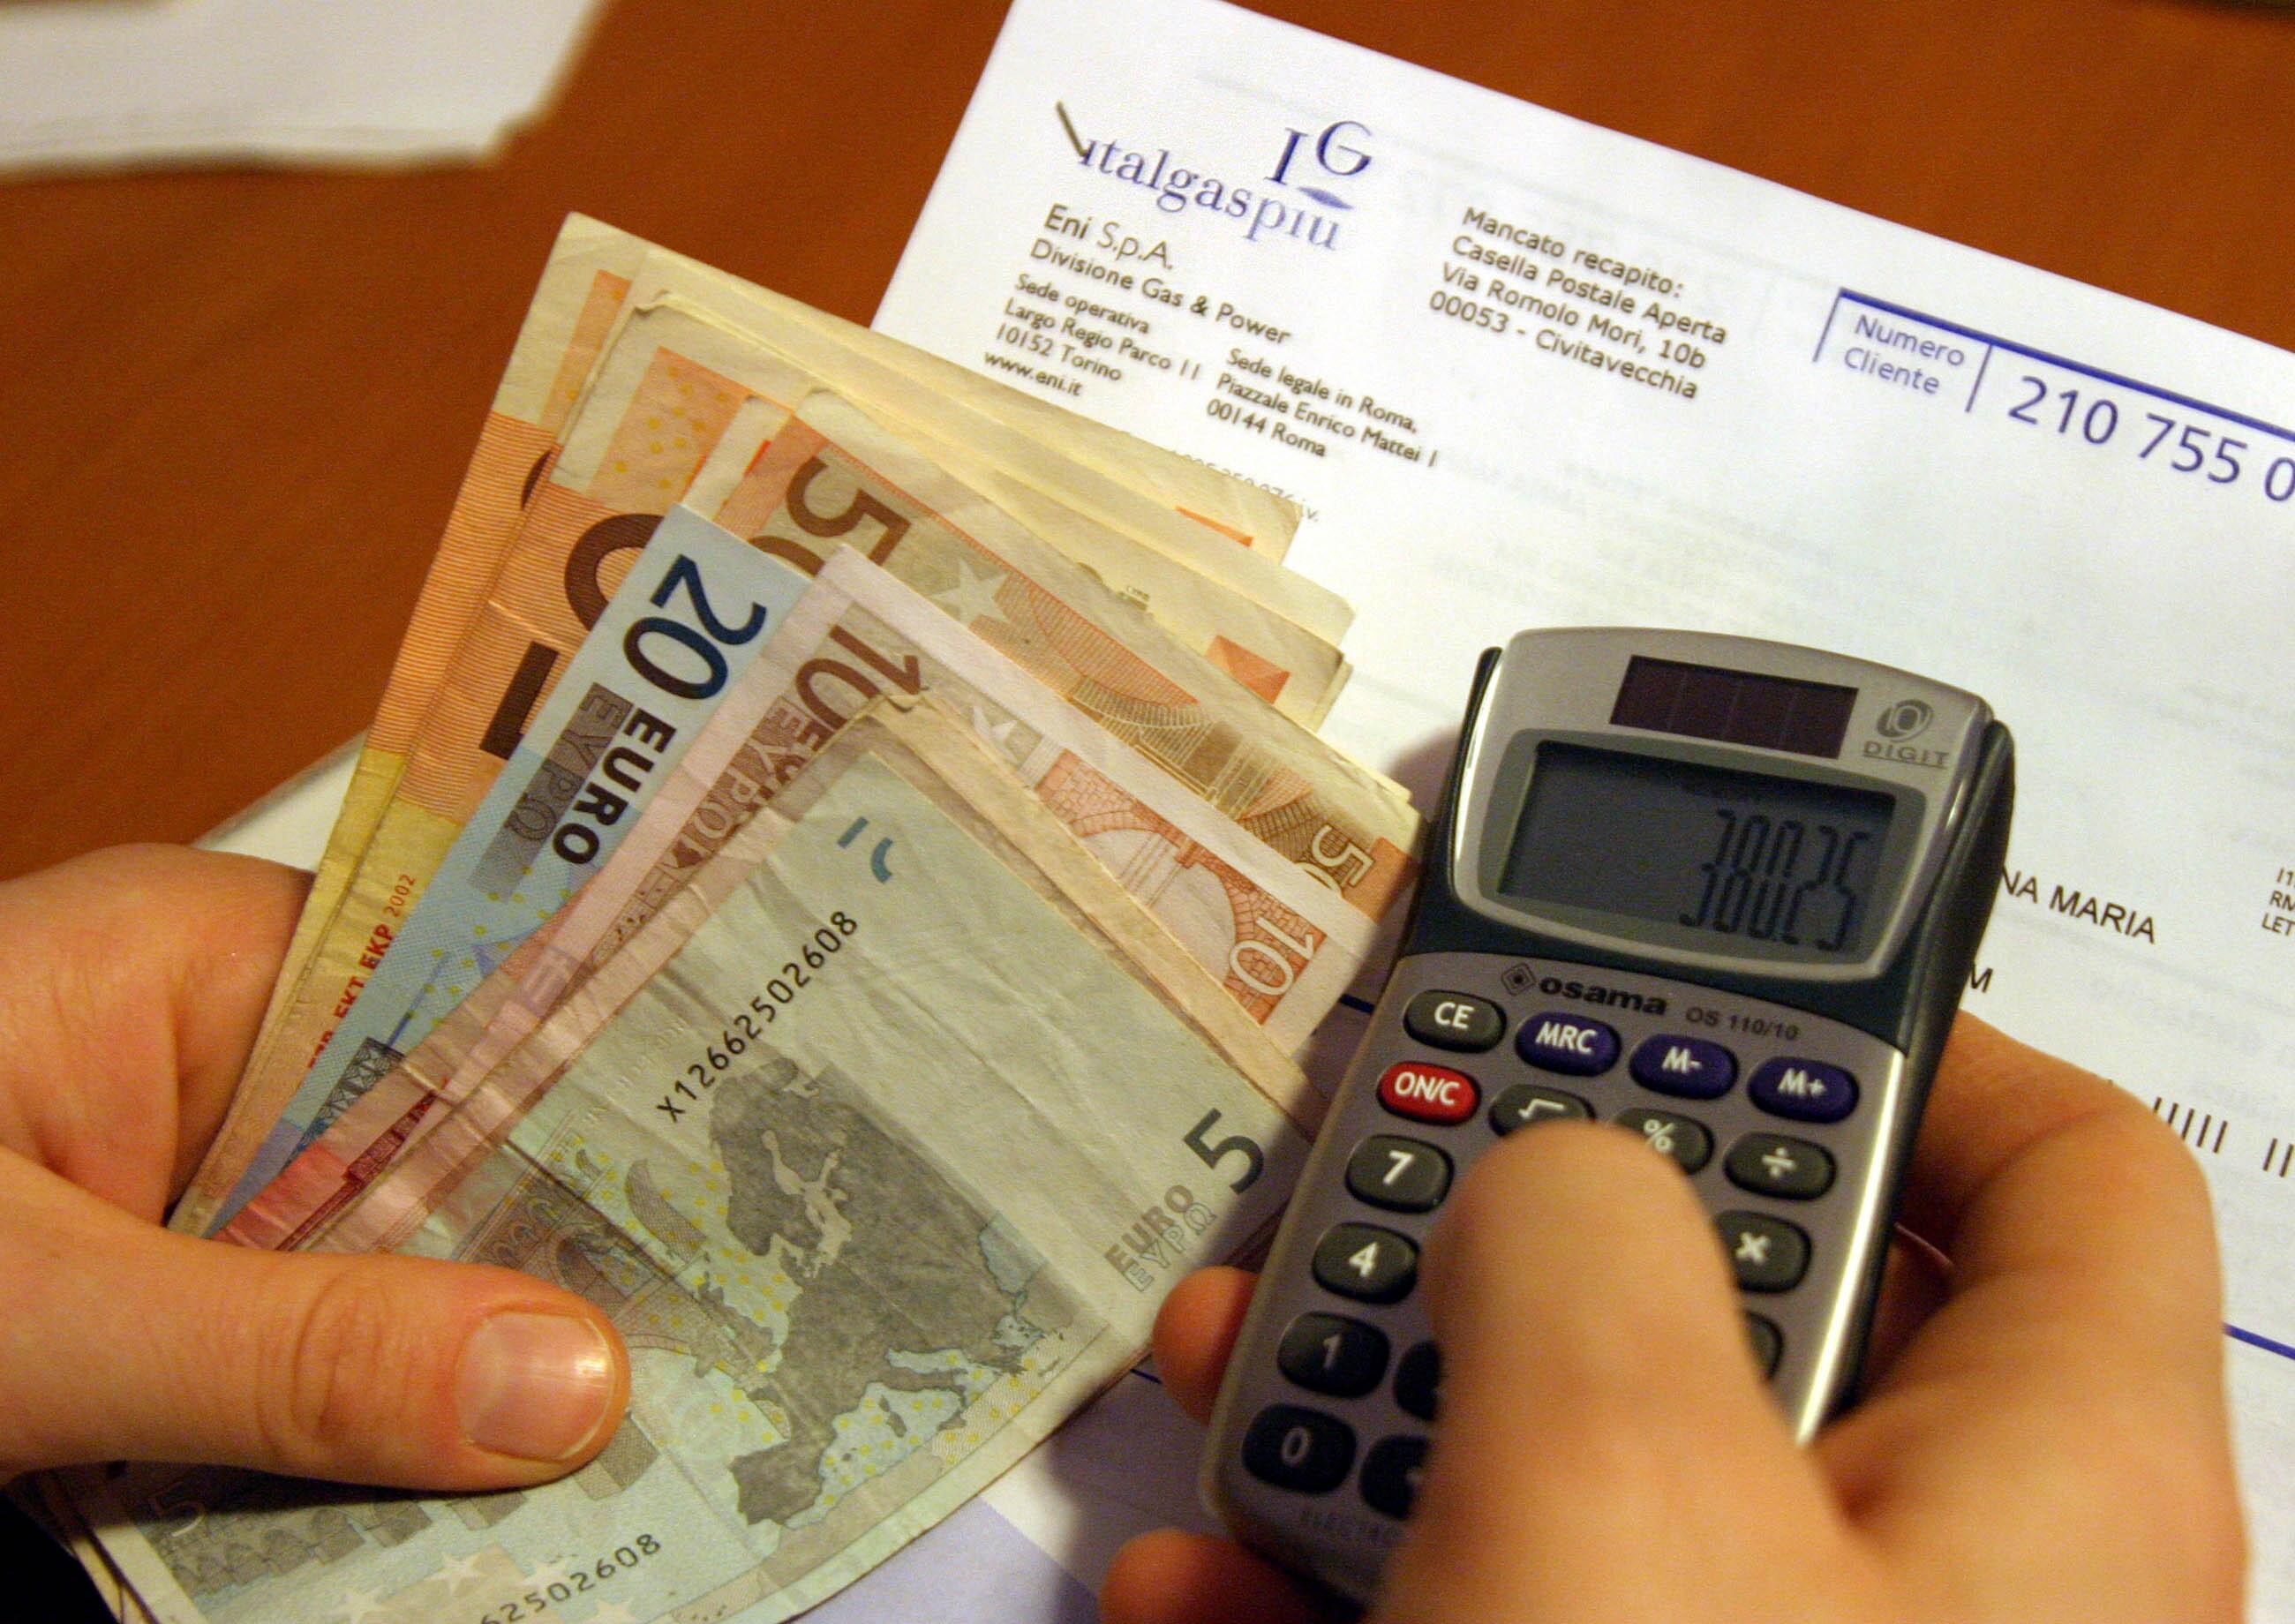 Risparmio Energetico Case Vecchie Bollette Piu Care Tgcom24